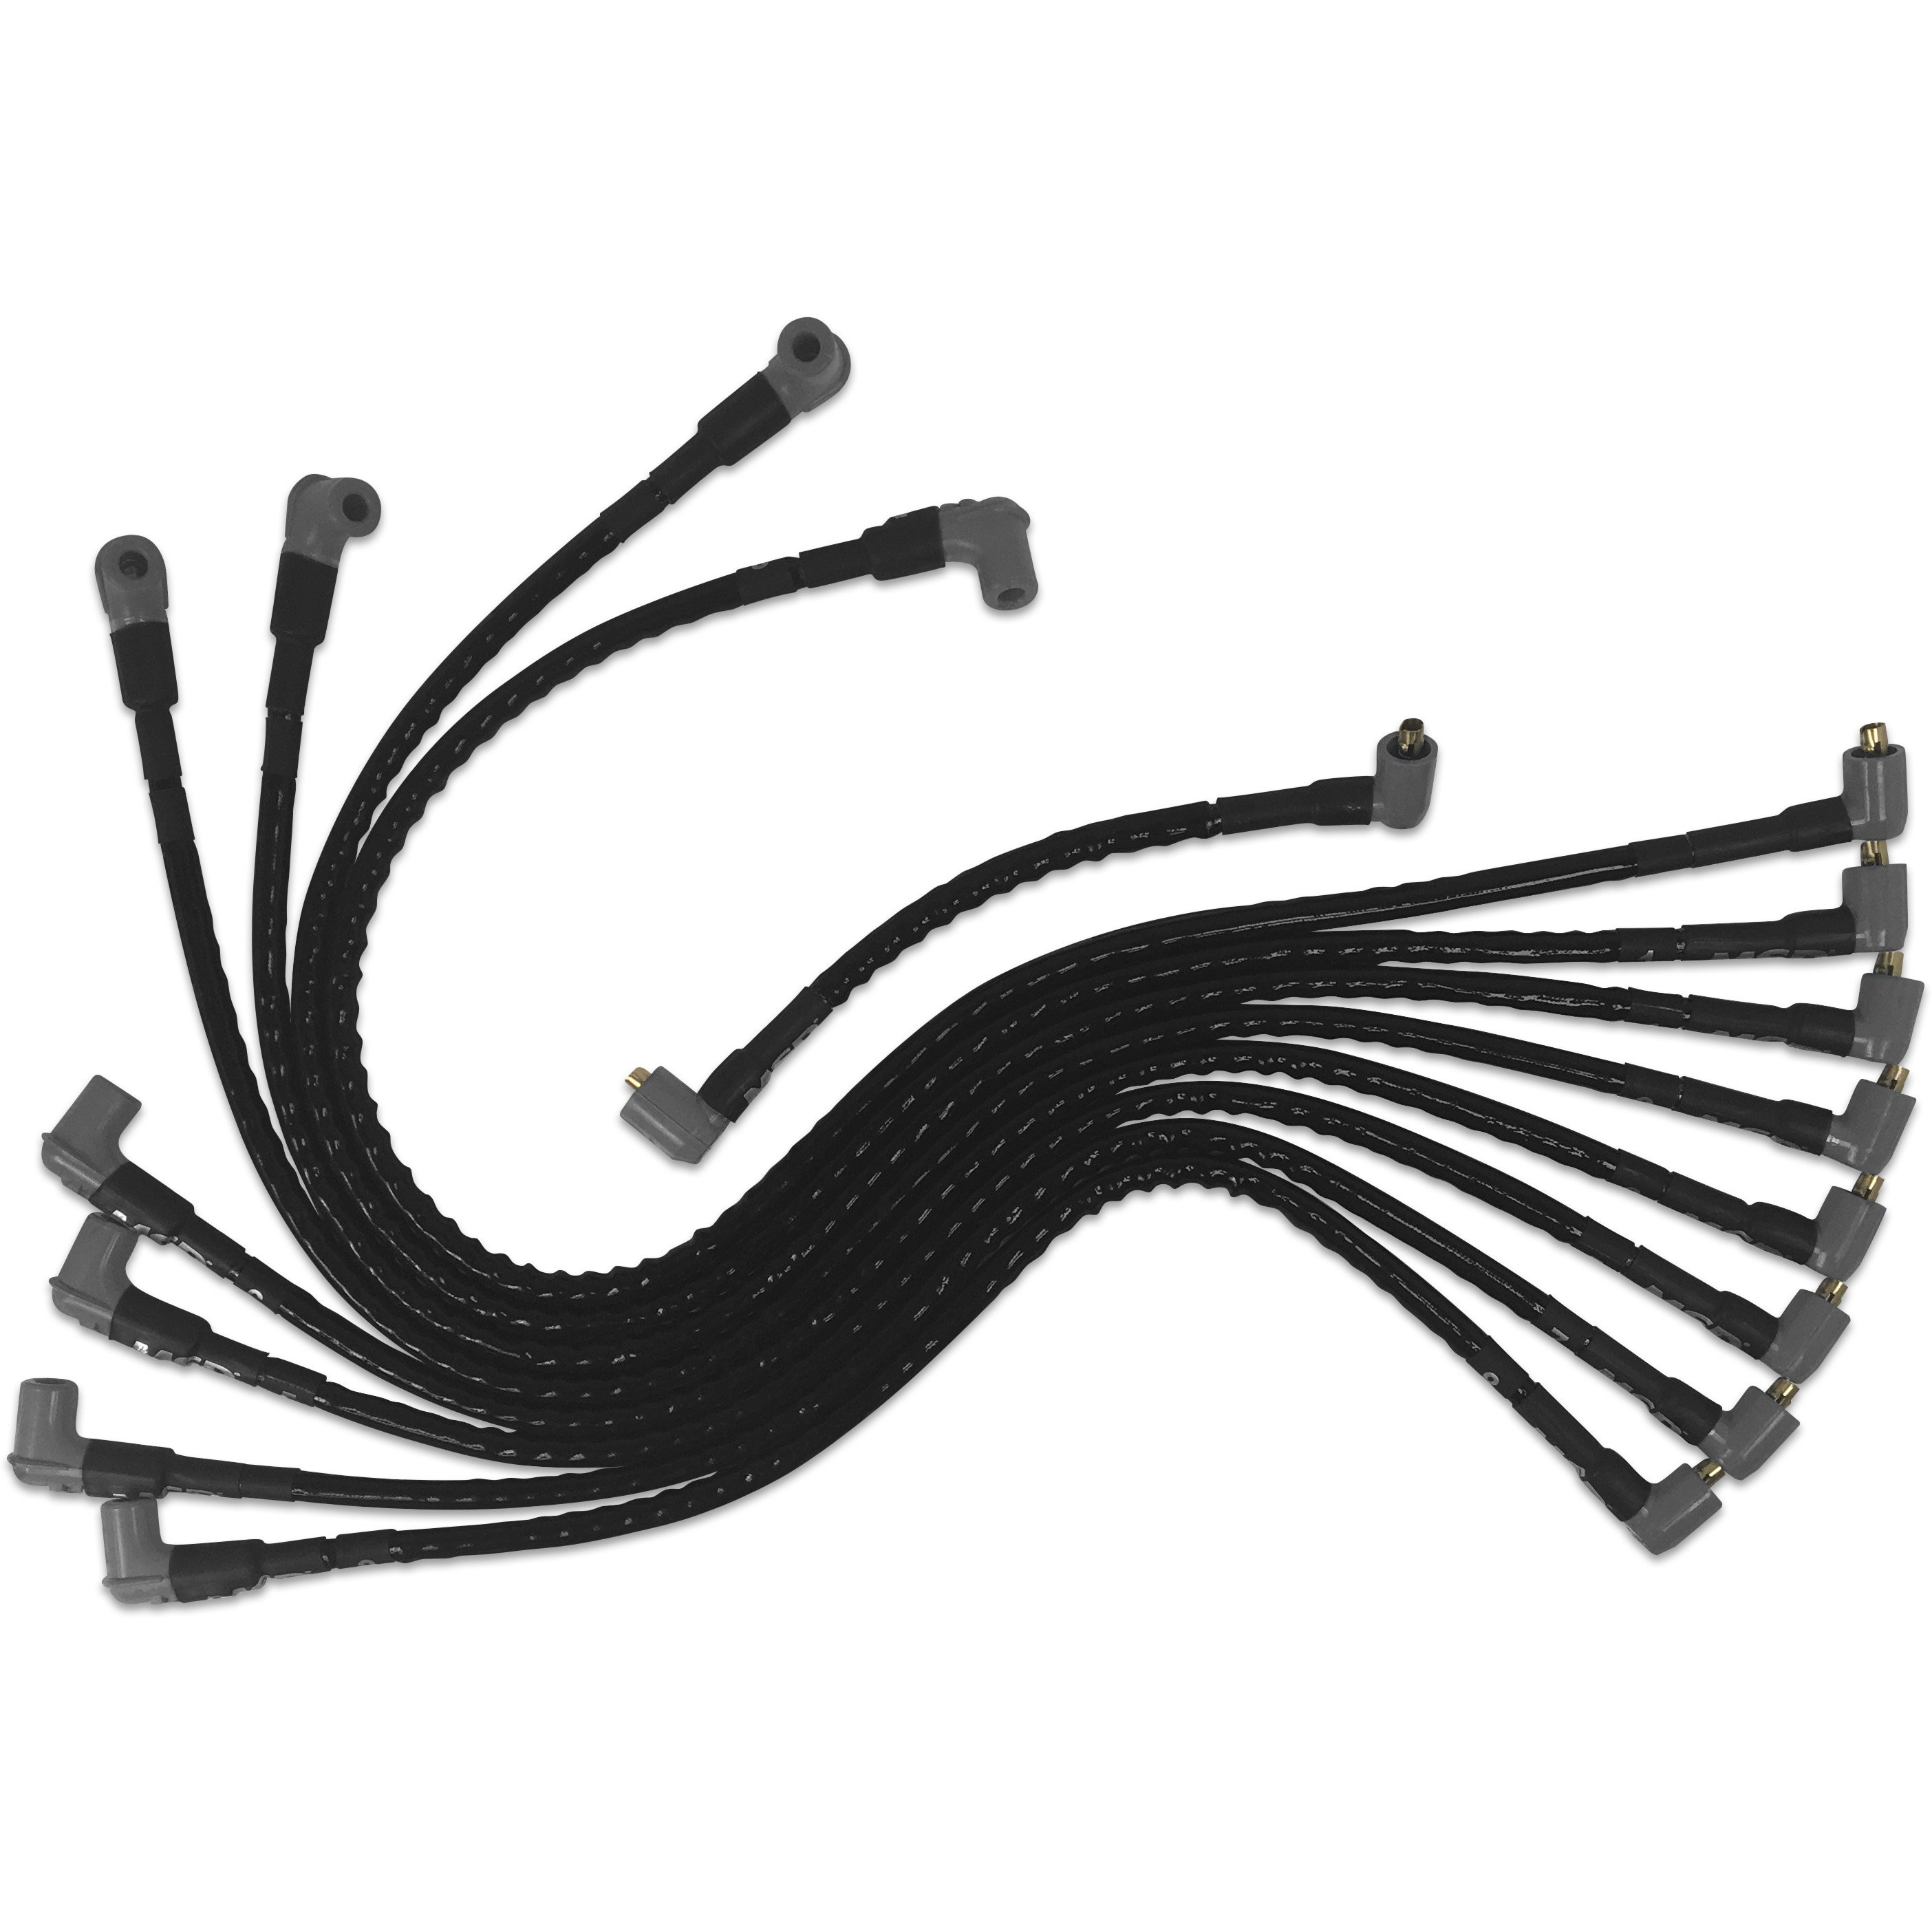 8mm for CHEVROLET BLAZER G10 G20 G30 R10 GMC K1500 Spark Plug Ignition Wire Set